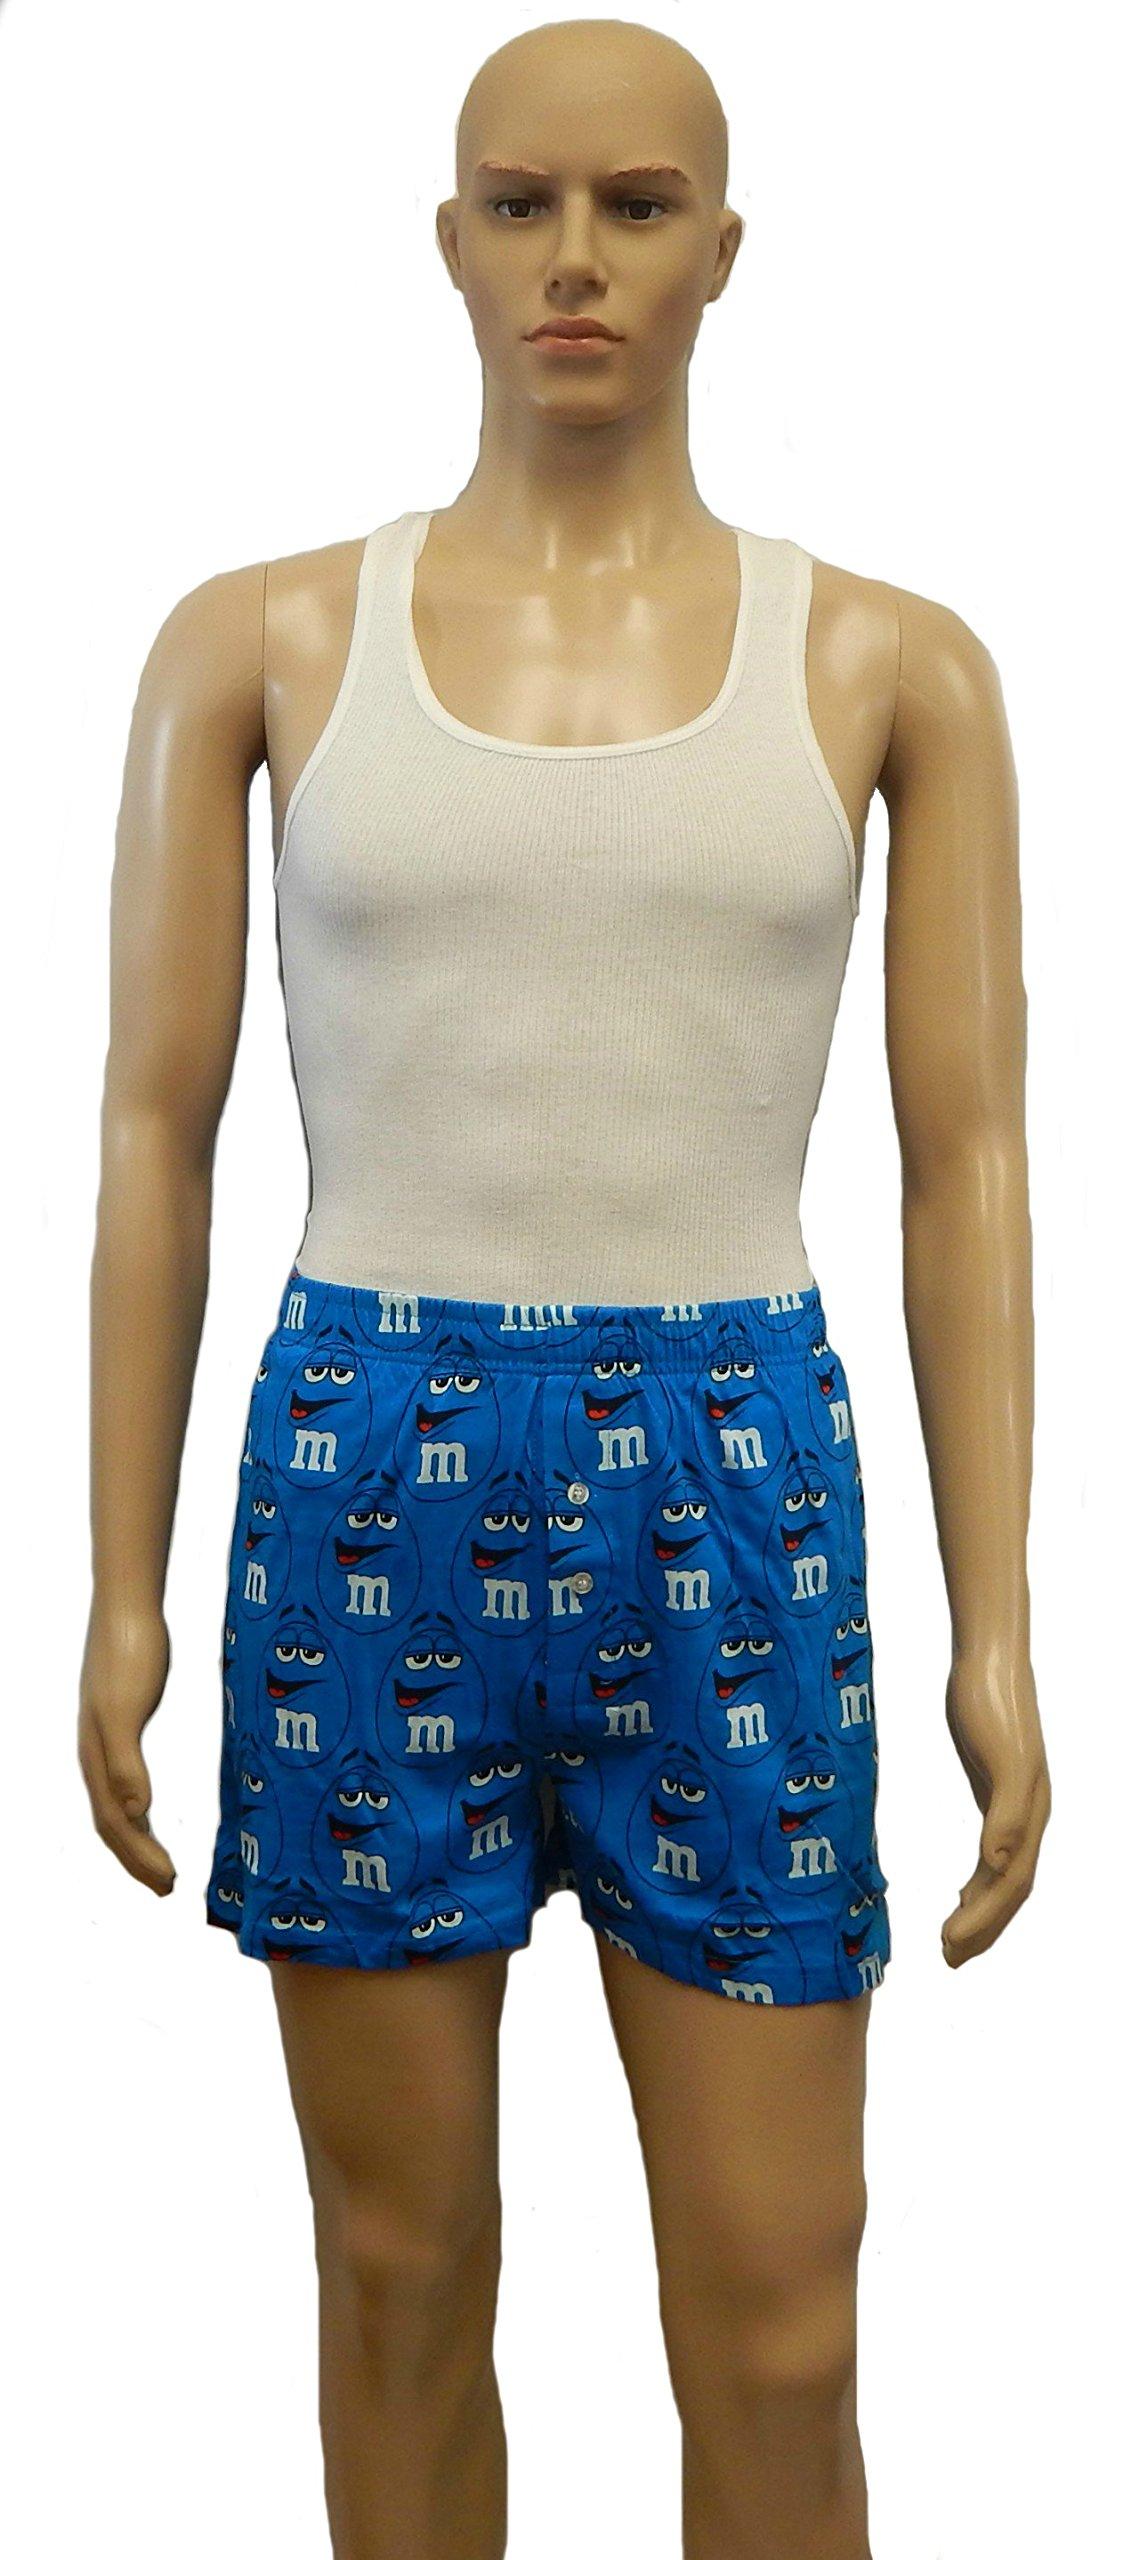 M&M's Candy Character Boxer Shorts Adult Pajama Lounge Sleep Bottoms Shorts Men's Sizing (X-Large, Blue Face)